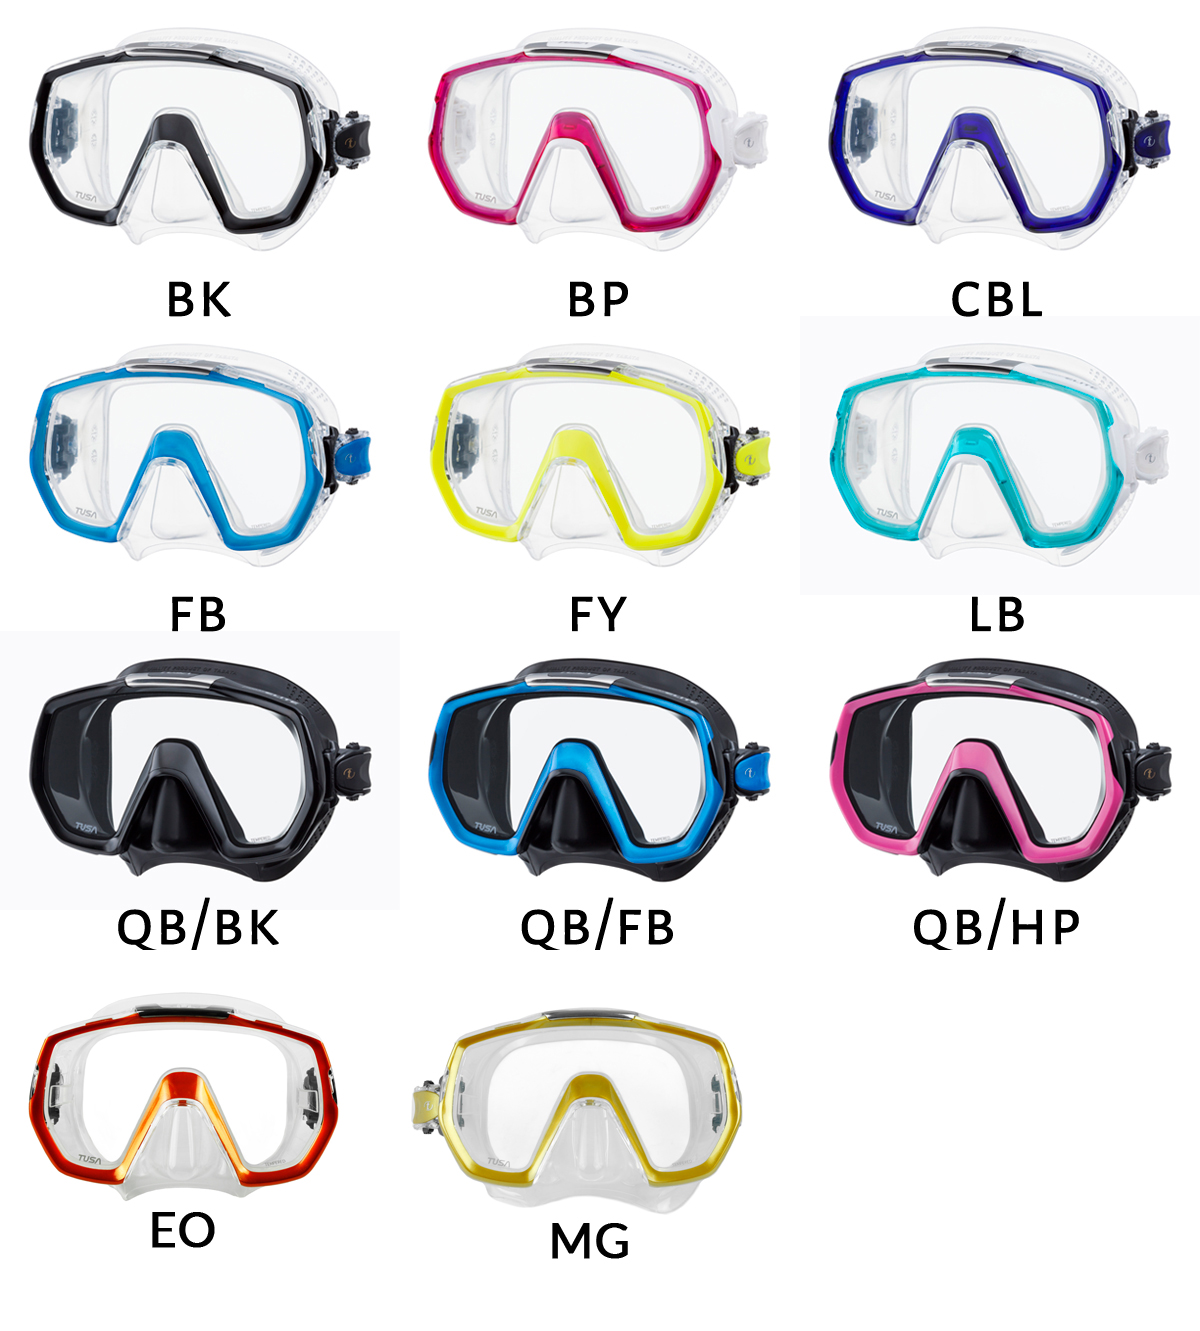 Maska TUSA Freedom Elite (M-1003) – kolory masek